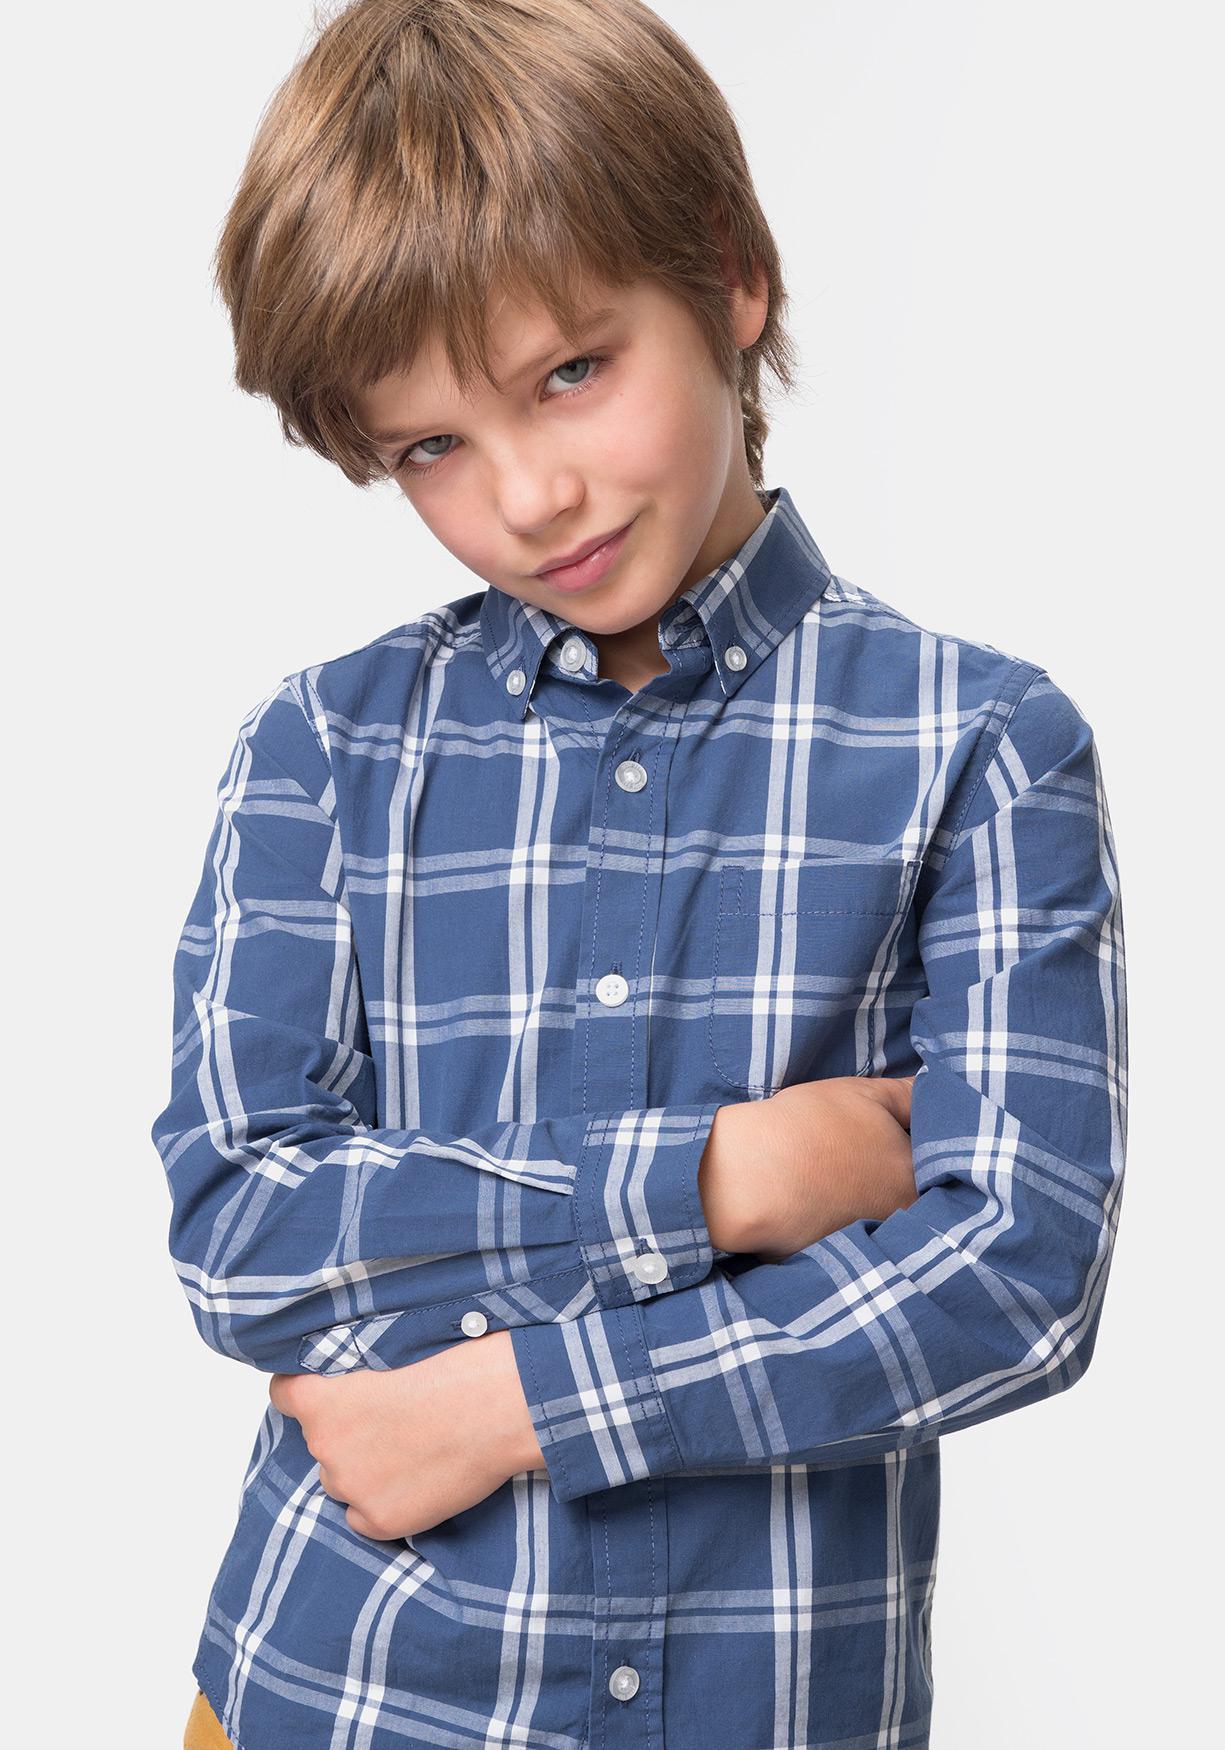 edd55fc1233 Comprar Camisa de cuadros manga larga TEX. ¡Aprovéchate de nuestros ...